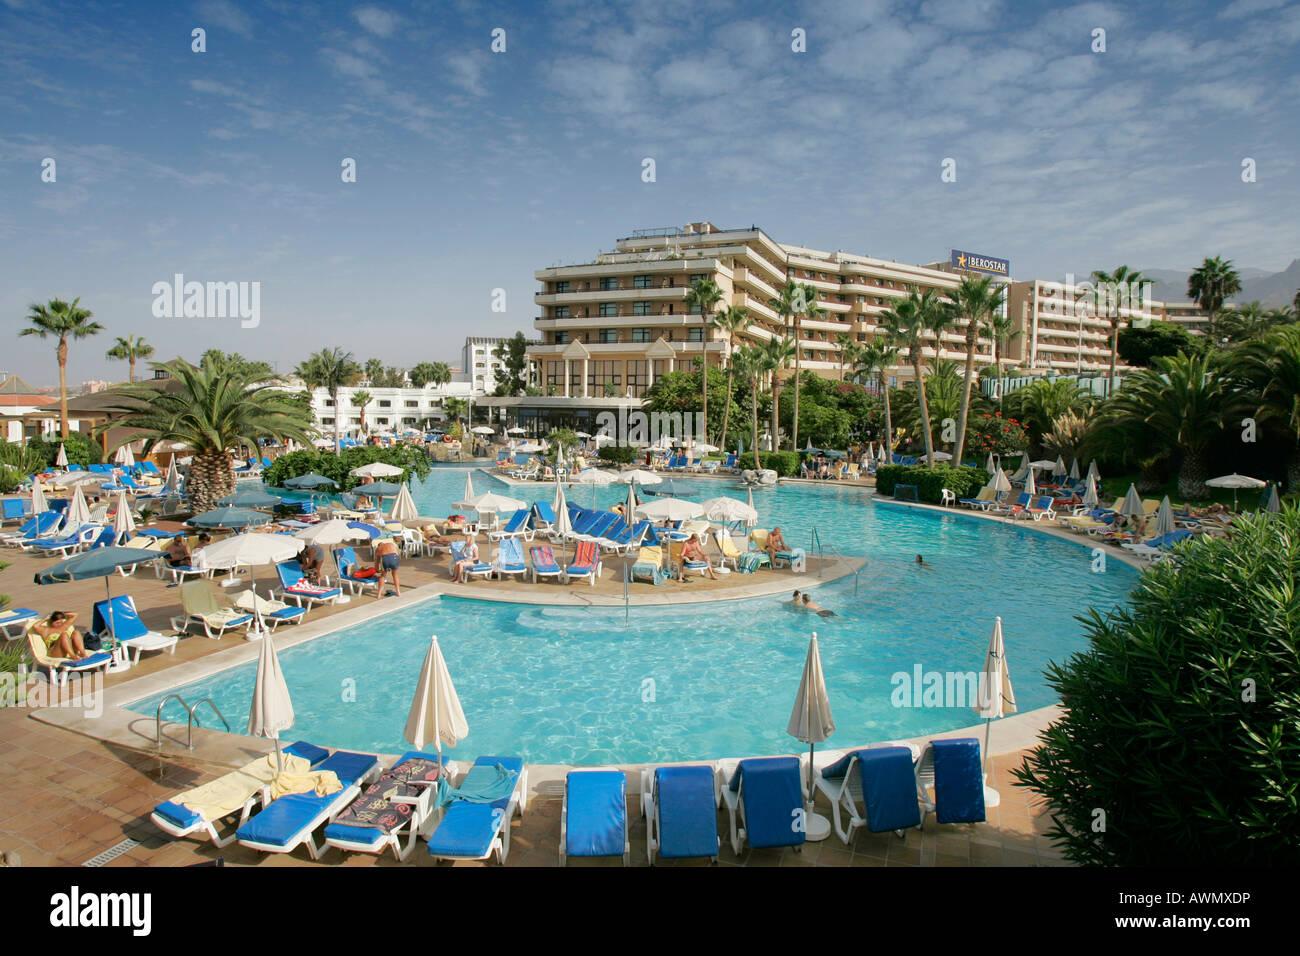 Hotel Torviscas Playa Costa Adeje Tenerife